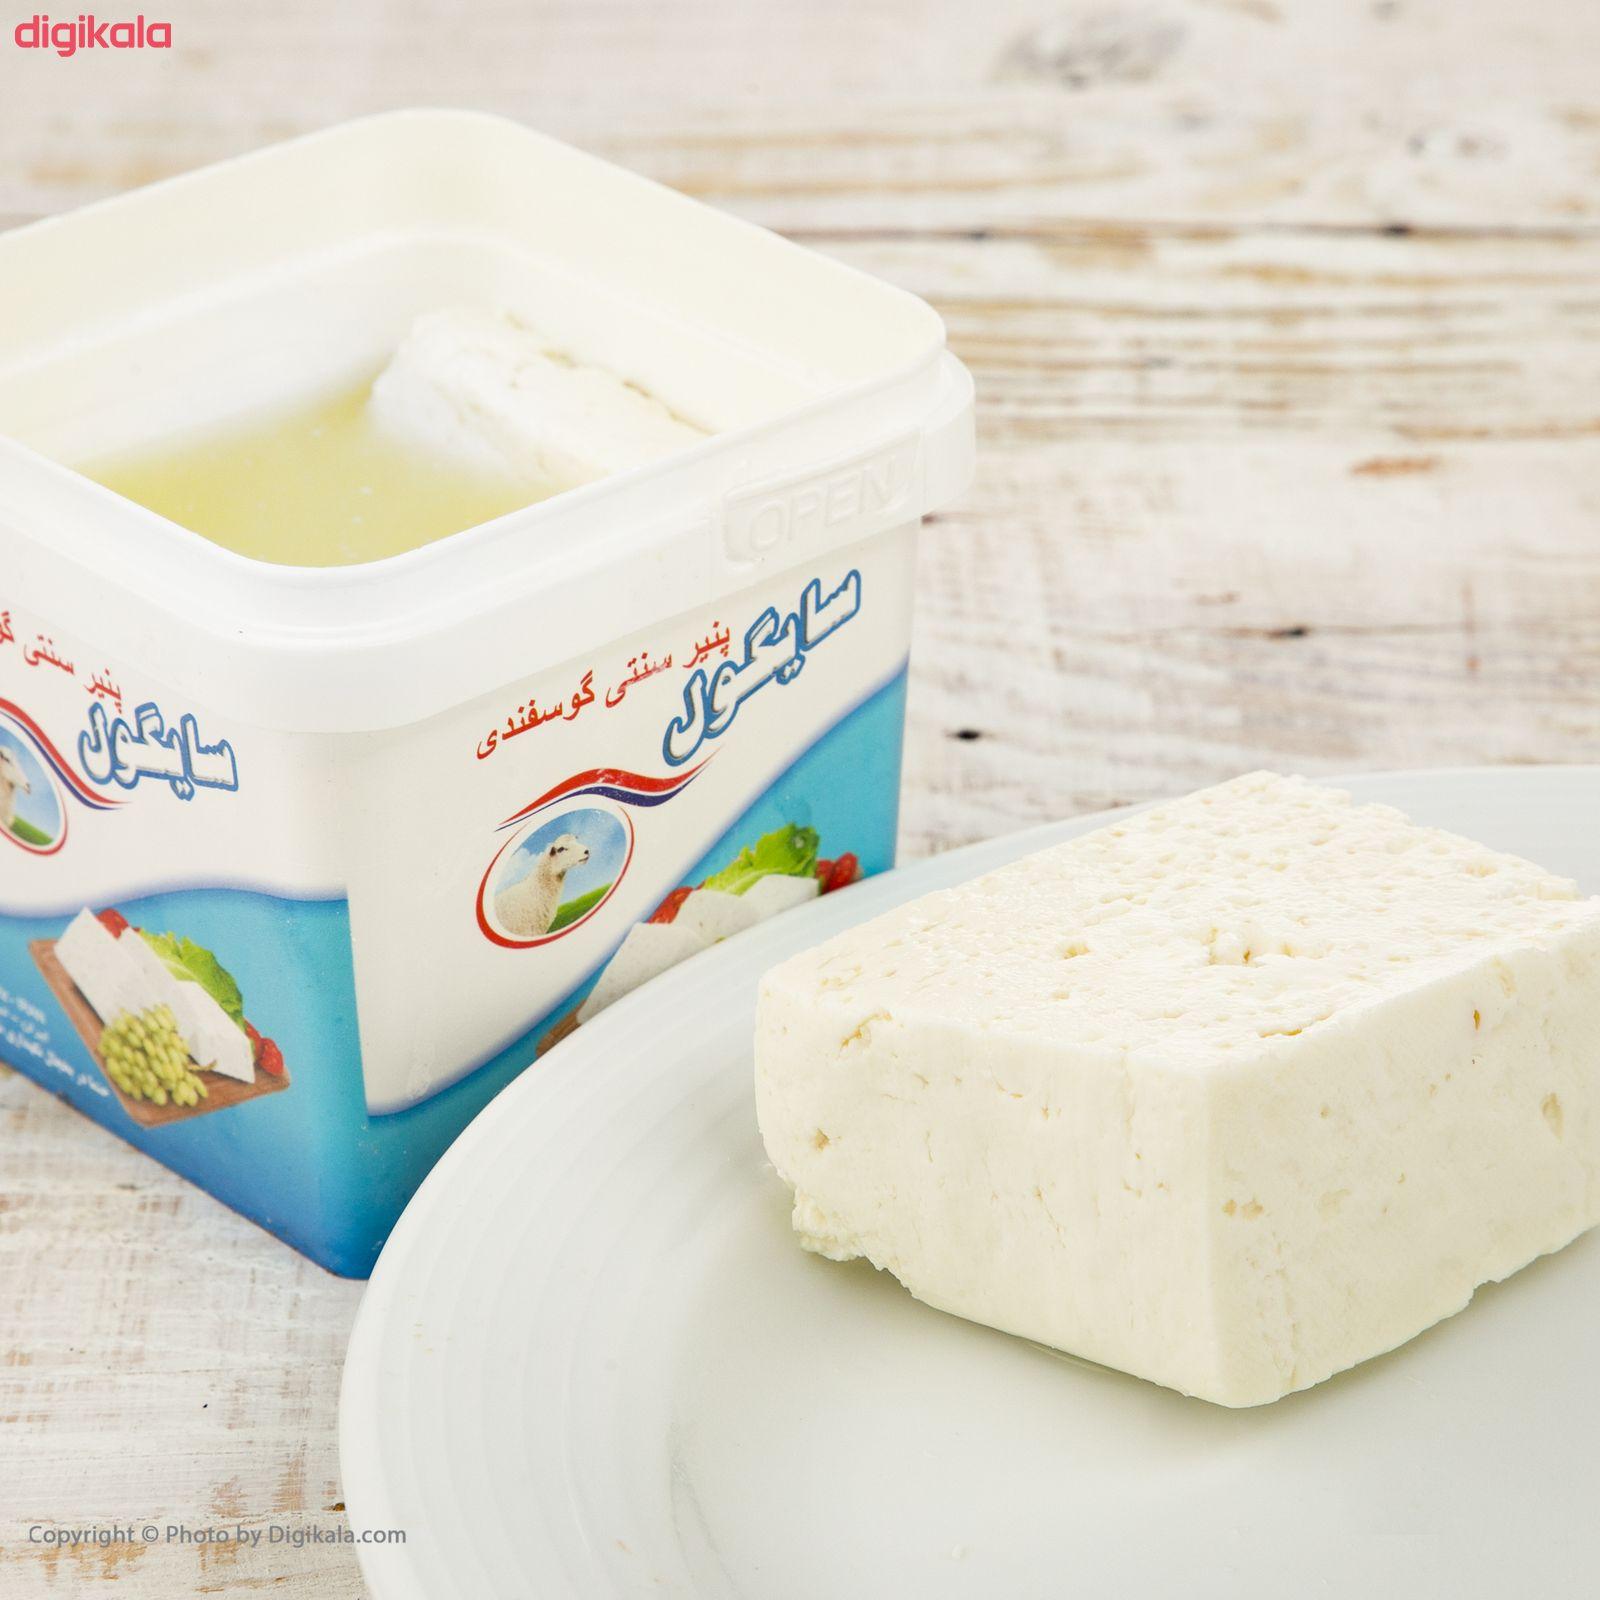 پنیر سنتی گوسفندی سایگول مقدار 350 گرم main 1 6